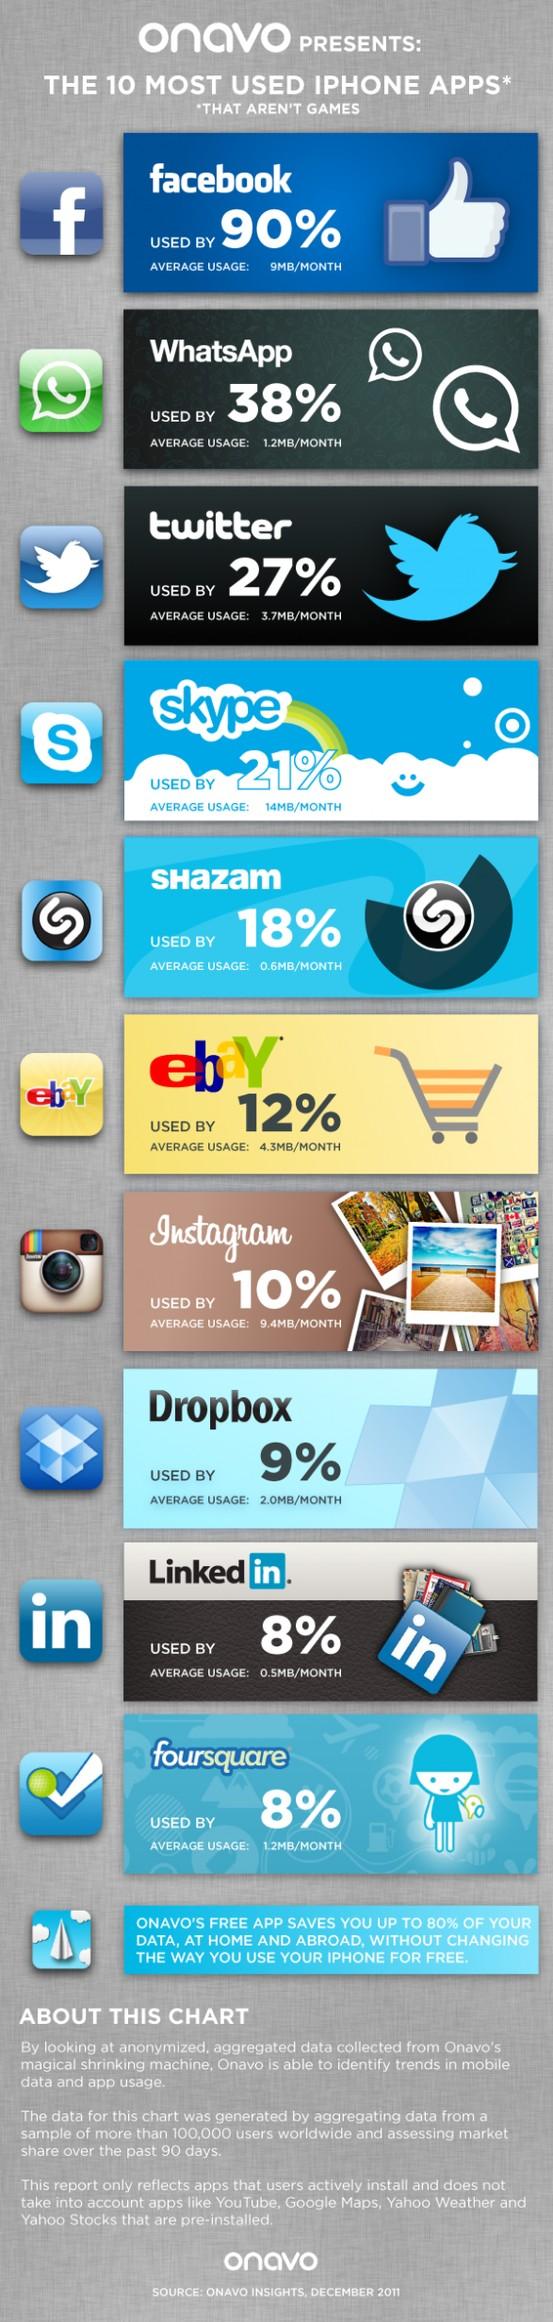 http://elproyectodealejandro.wordpress.com/2012/09/29/listado-de-las-aplicaciones-mas-usadas-en-iphone/?goback=%2Egde_1101417_member_170009679